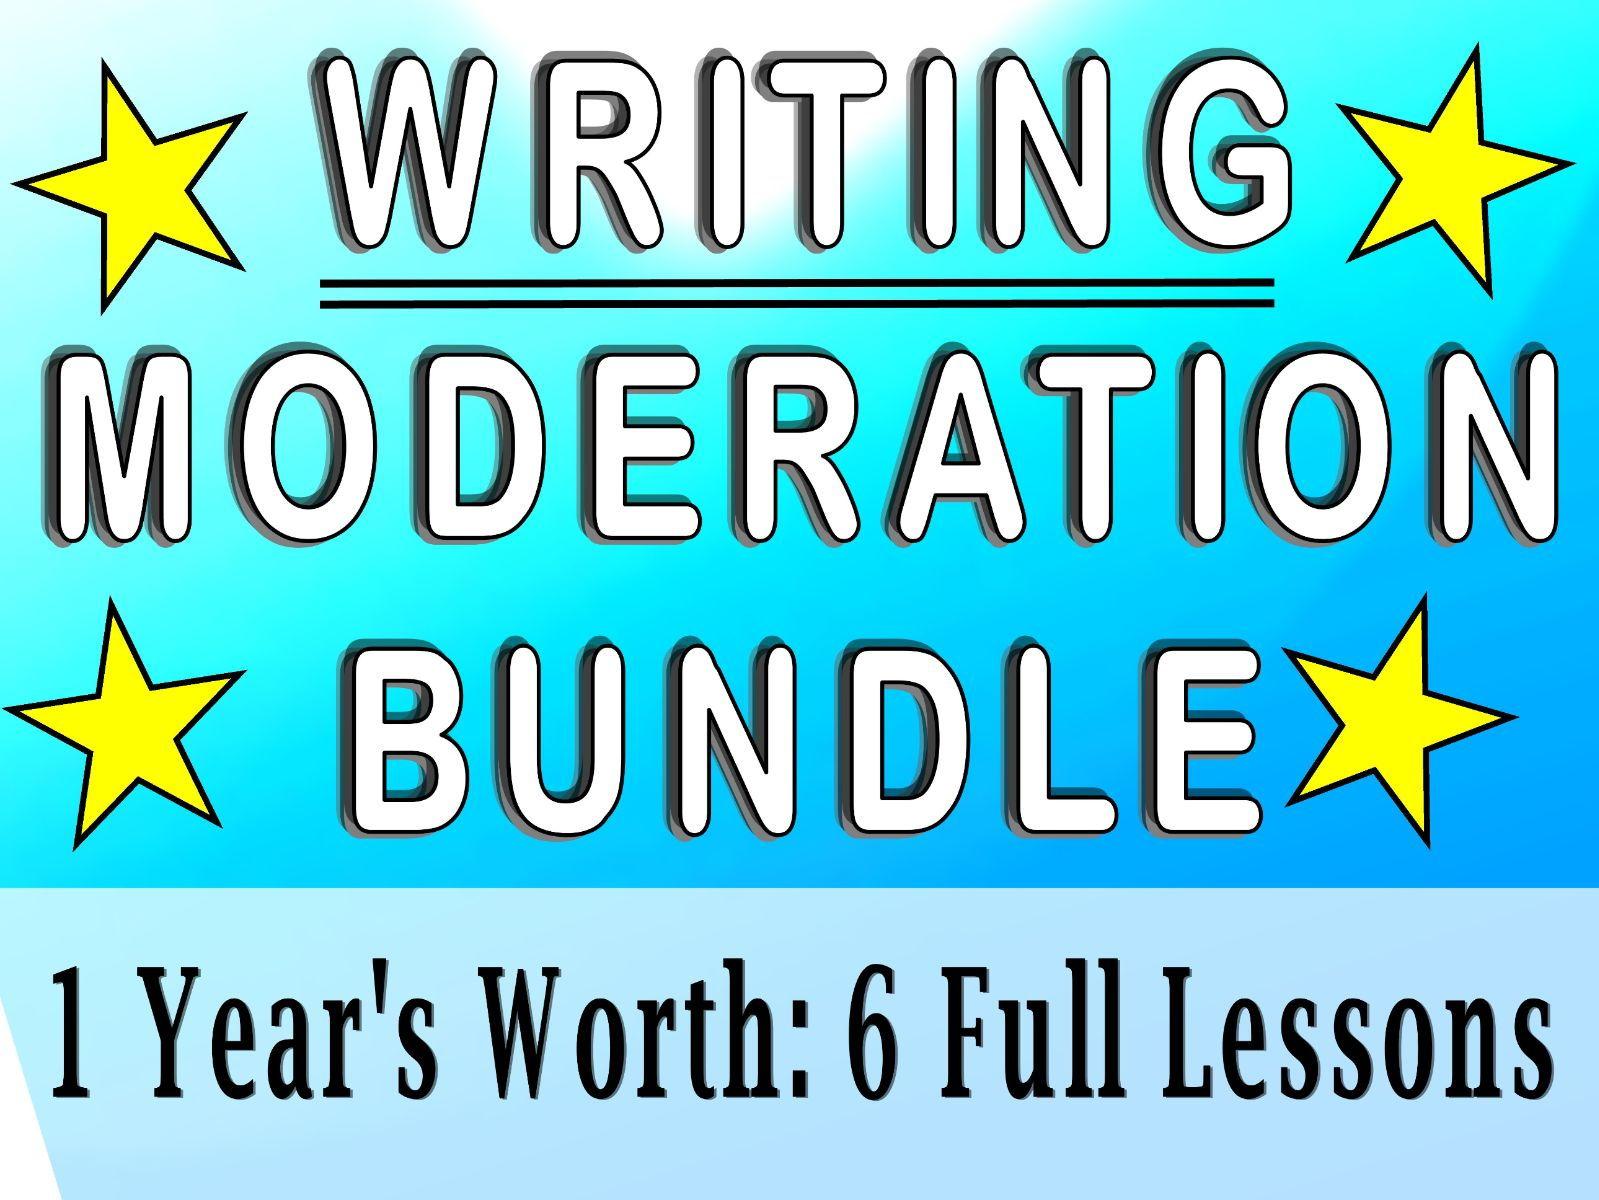 Writing Moderation Bundle - Whole School 6 Lessons